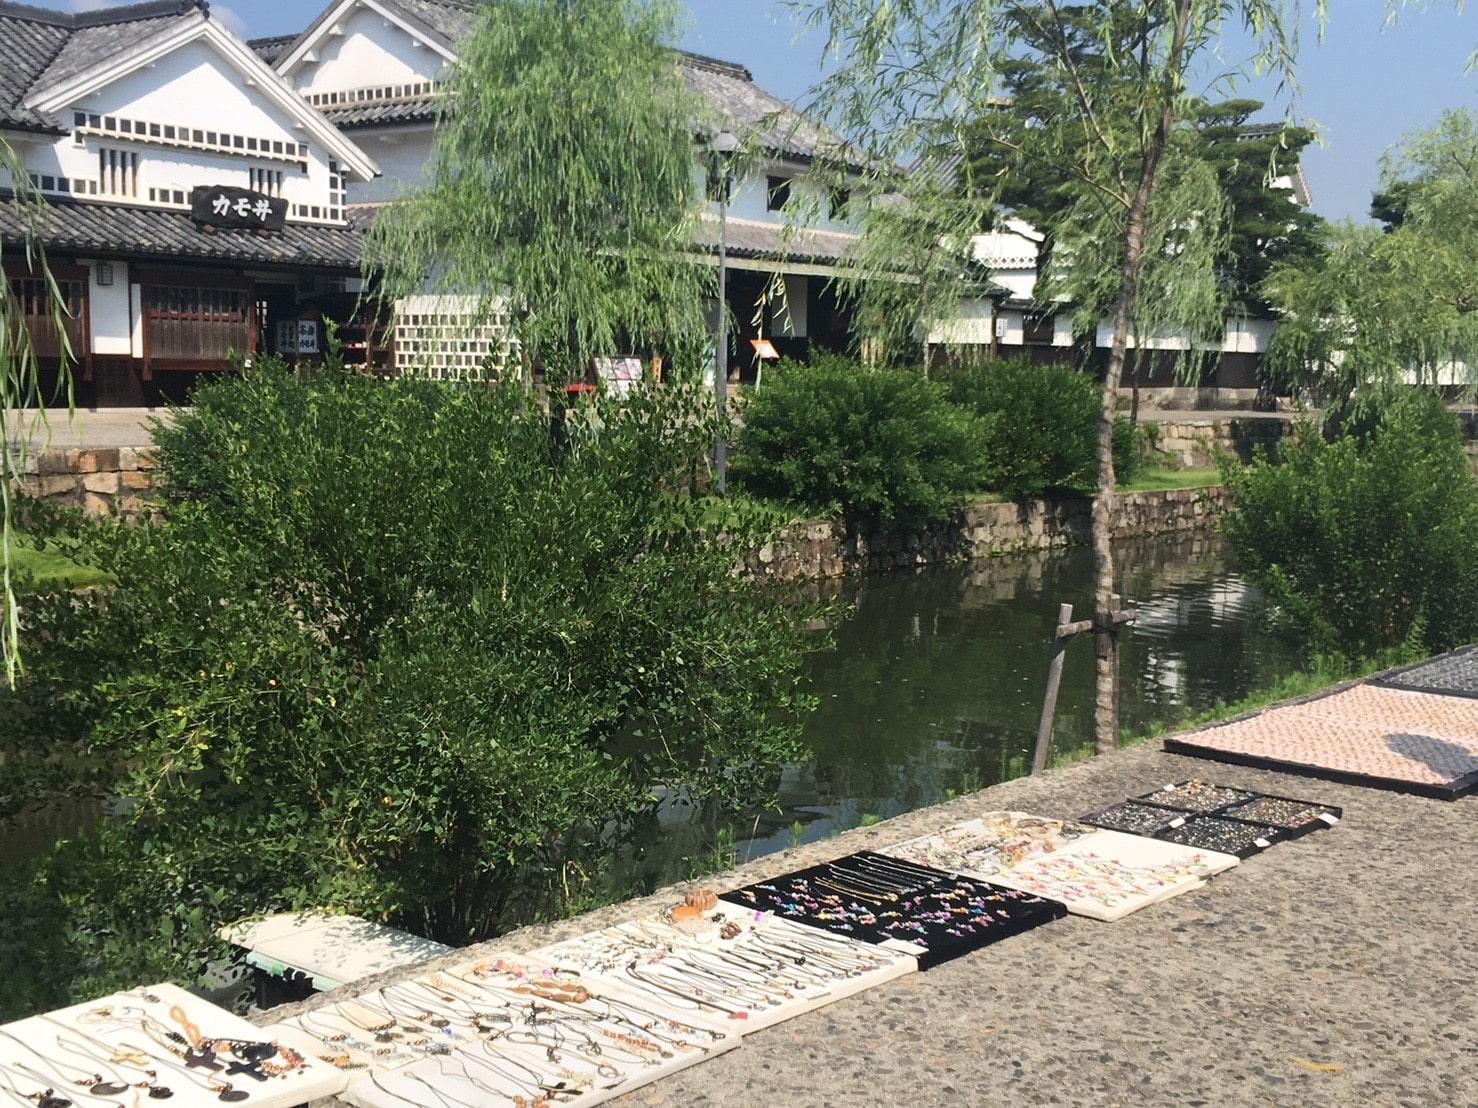 倉敷美観地区の露店